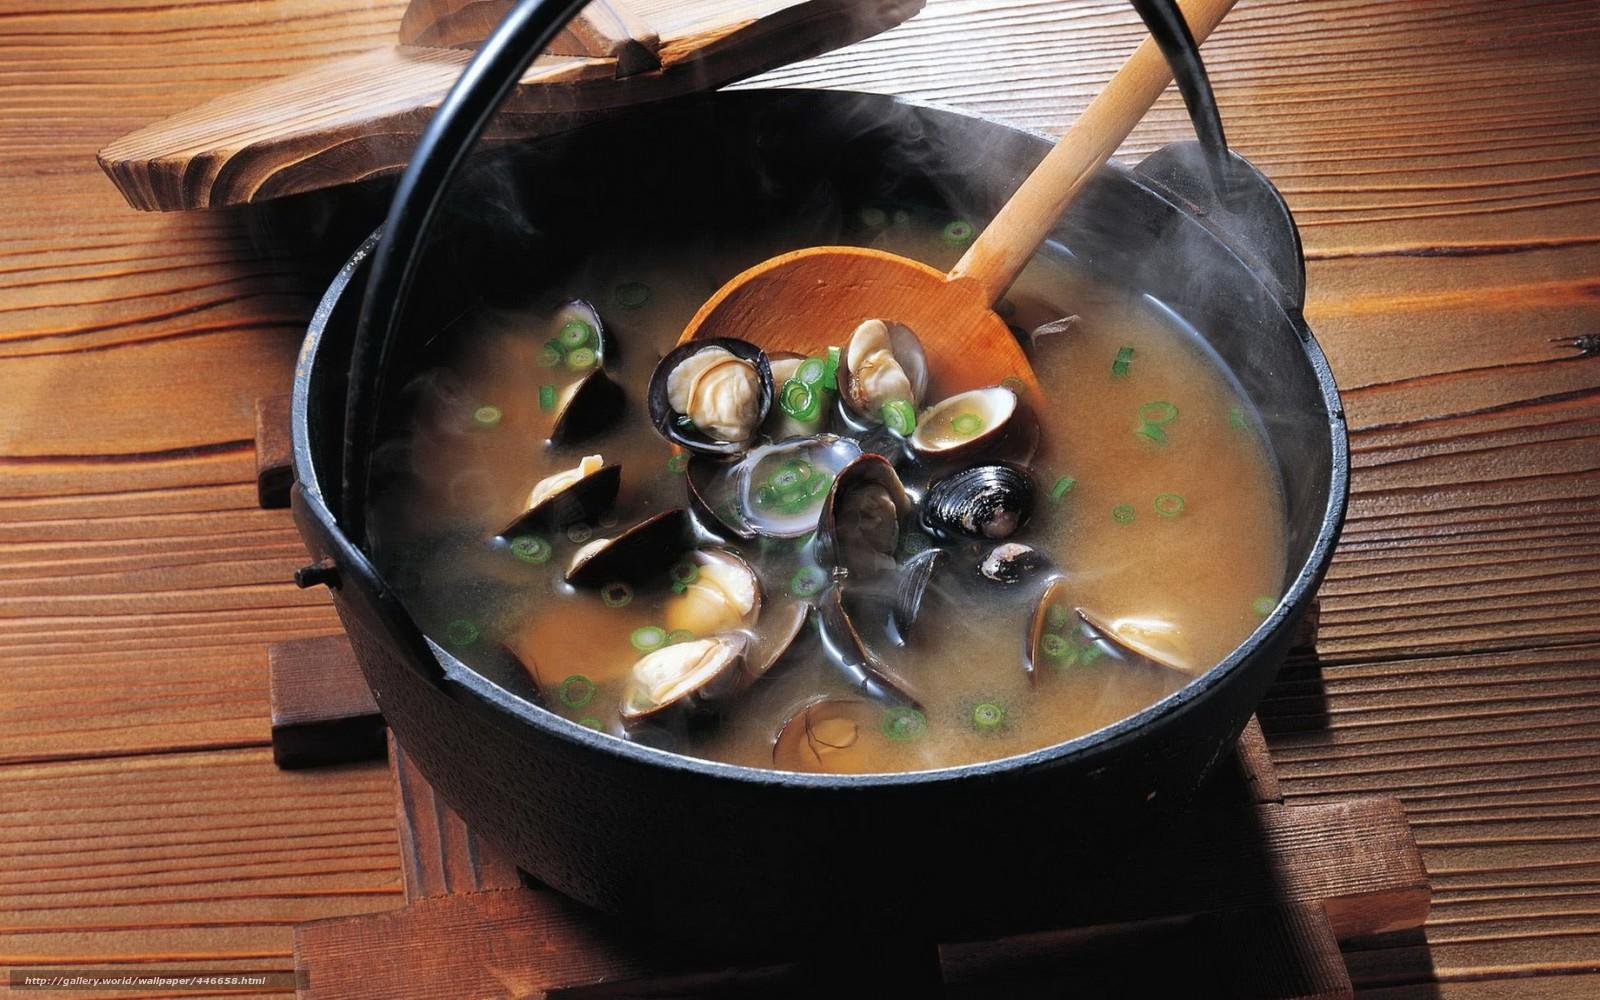 Download wallpaper soup,  boiler,  Mussels free desktop wallpaper in the resolution 1680x1050 — picture №446658